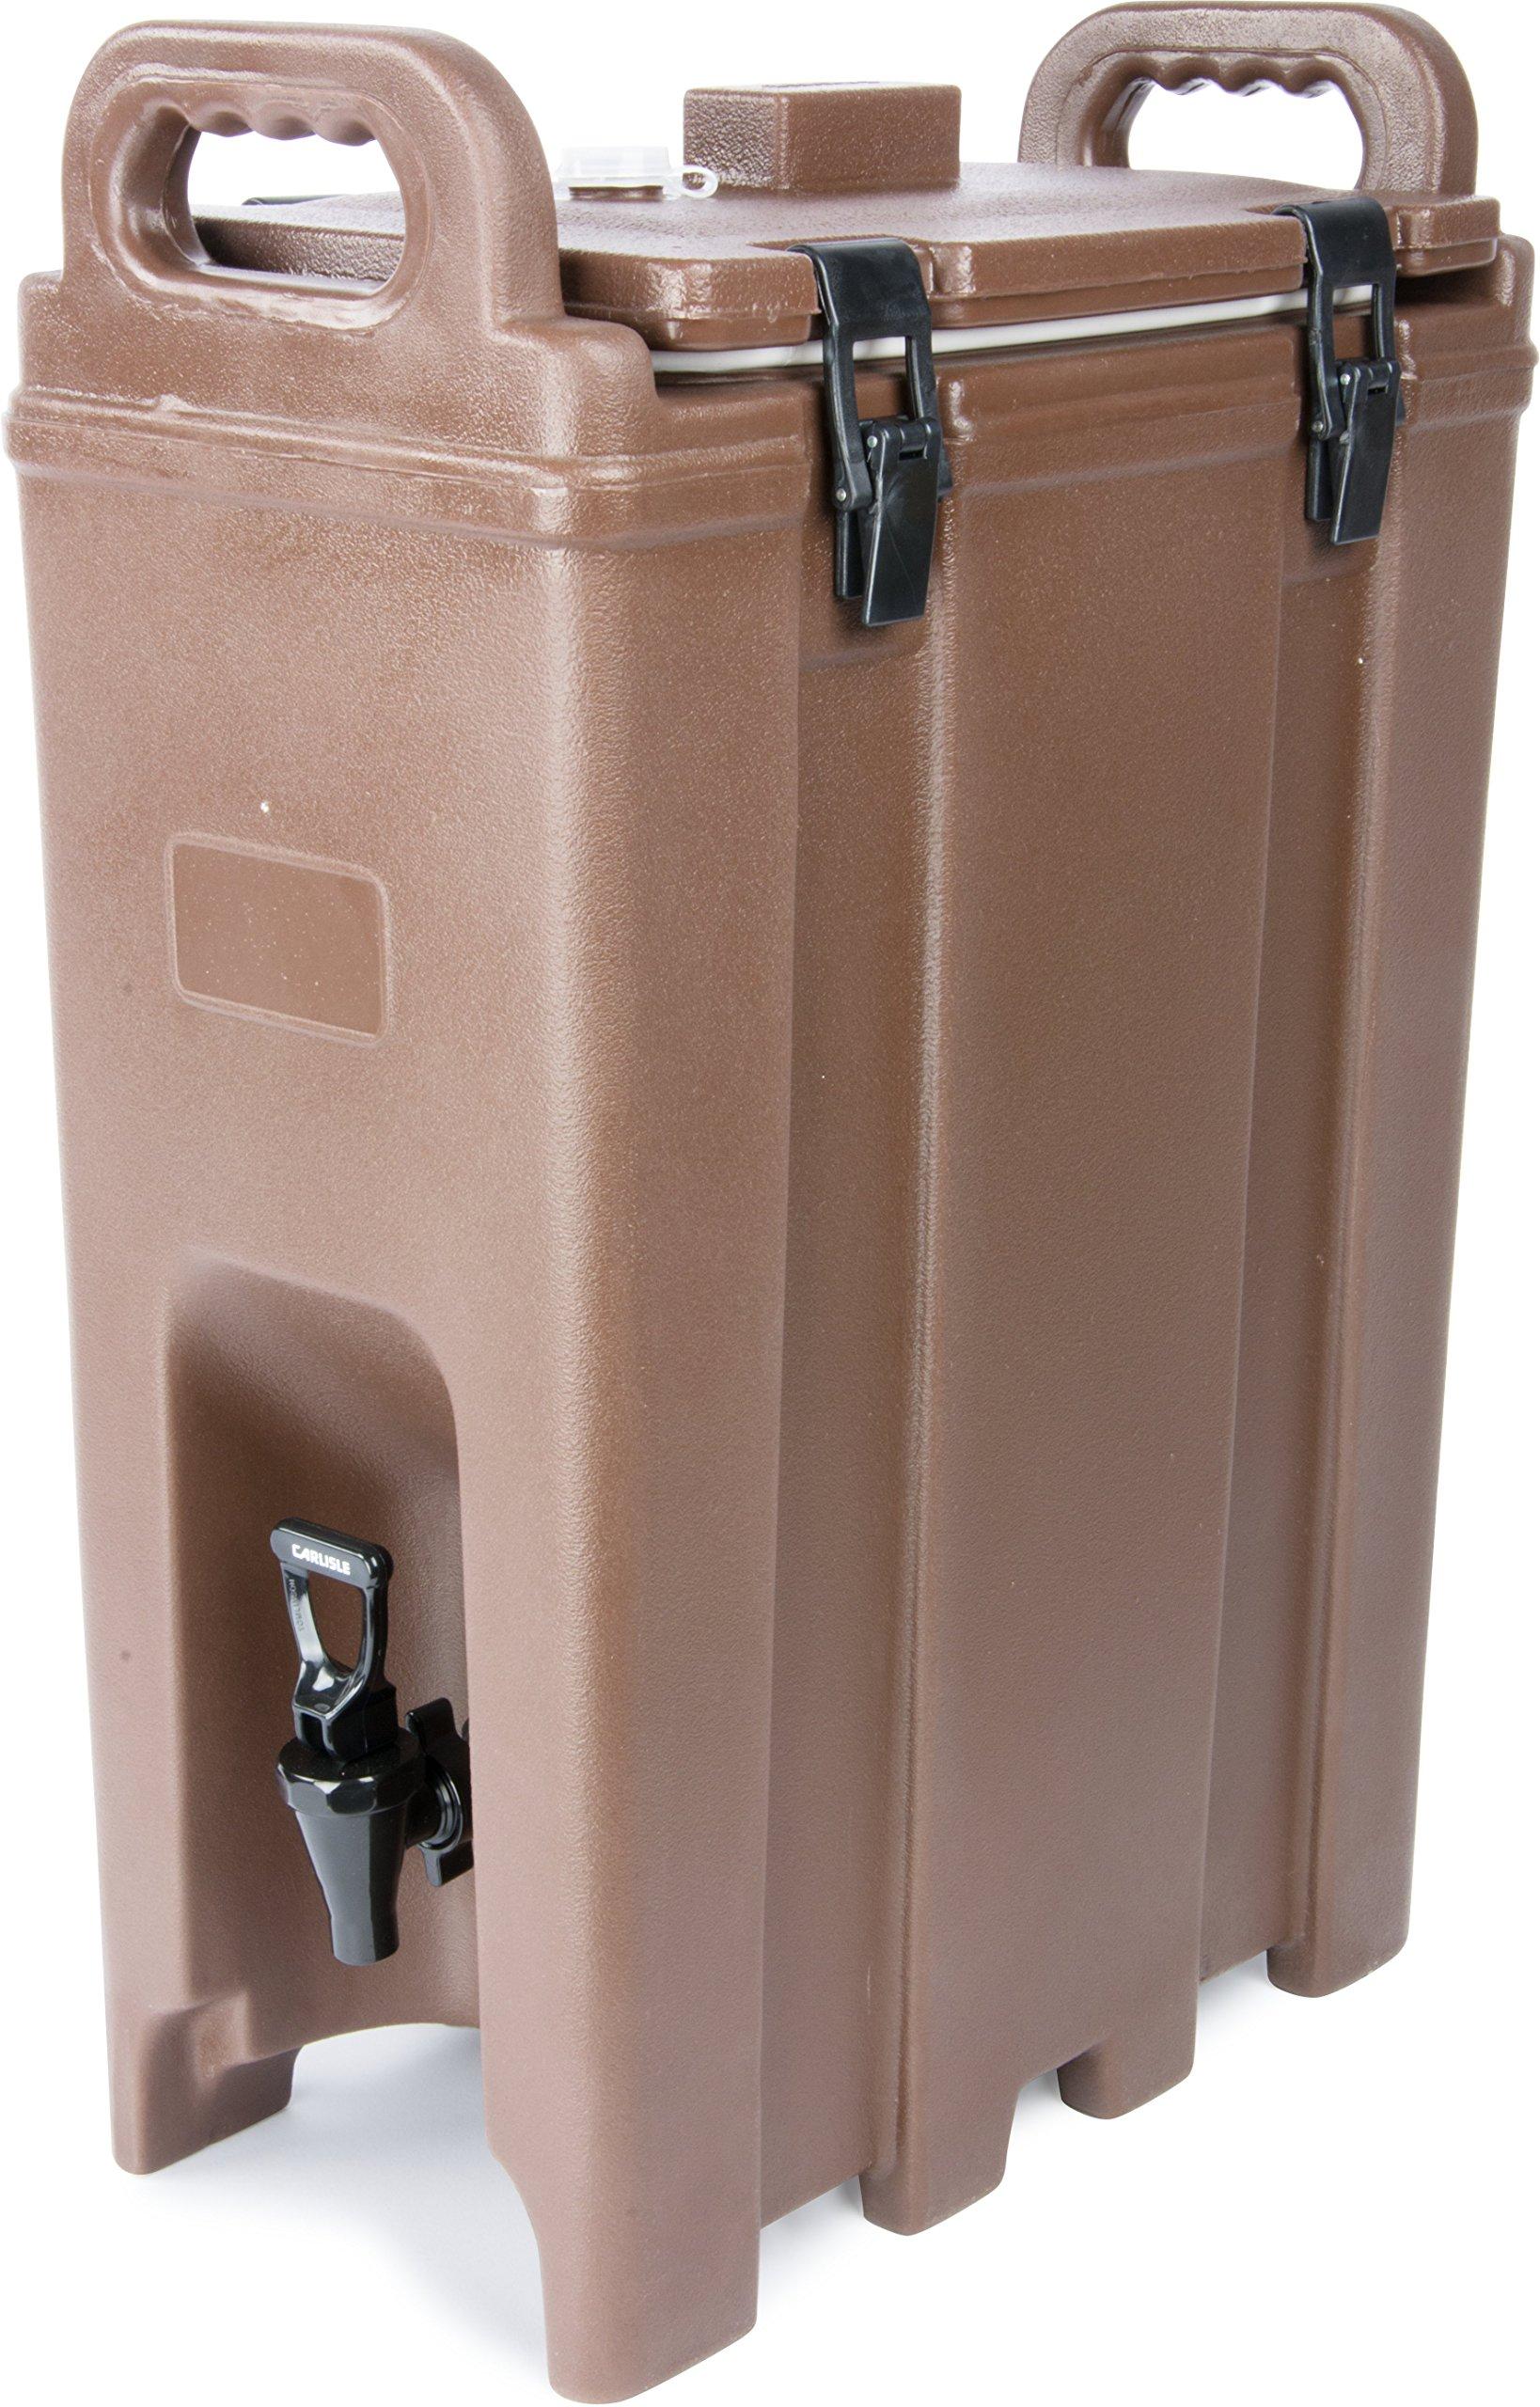 Carlisle LD500N01 Cateraide Polyethylene Insulated Beverage Server, 5 gal. Capacity, 16-3/8'' L x 9'' W x 24.20'' H, Brown